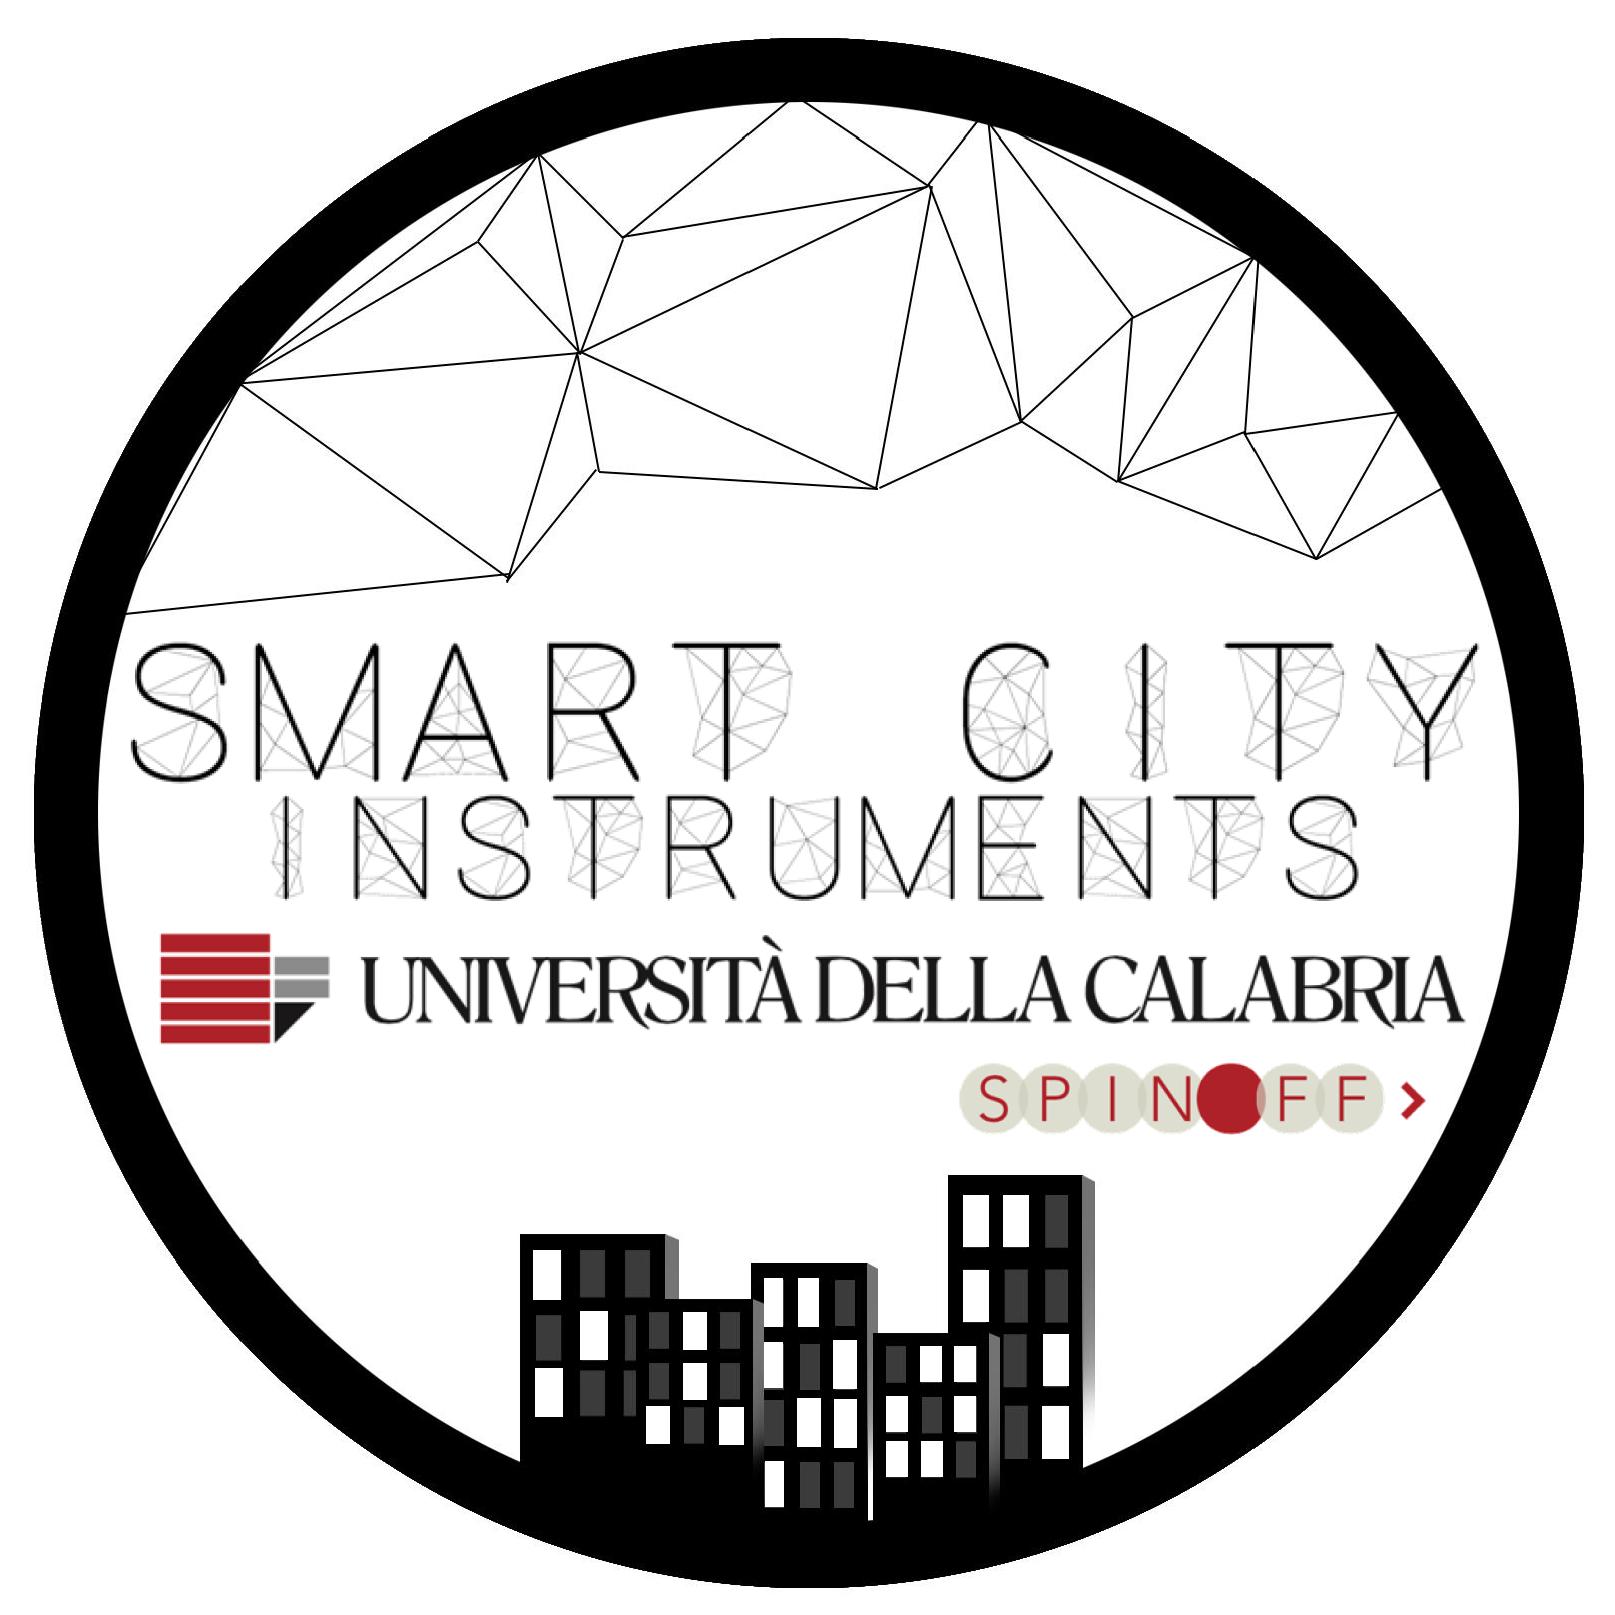 Smart City Instruments